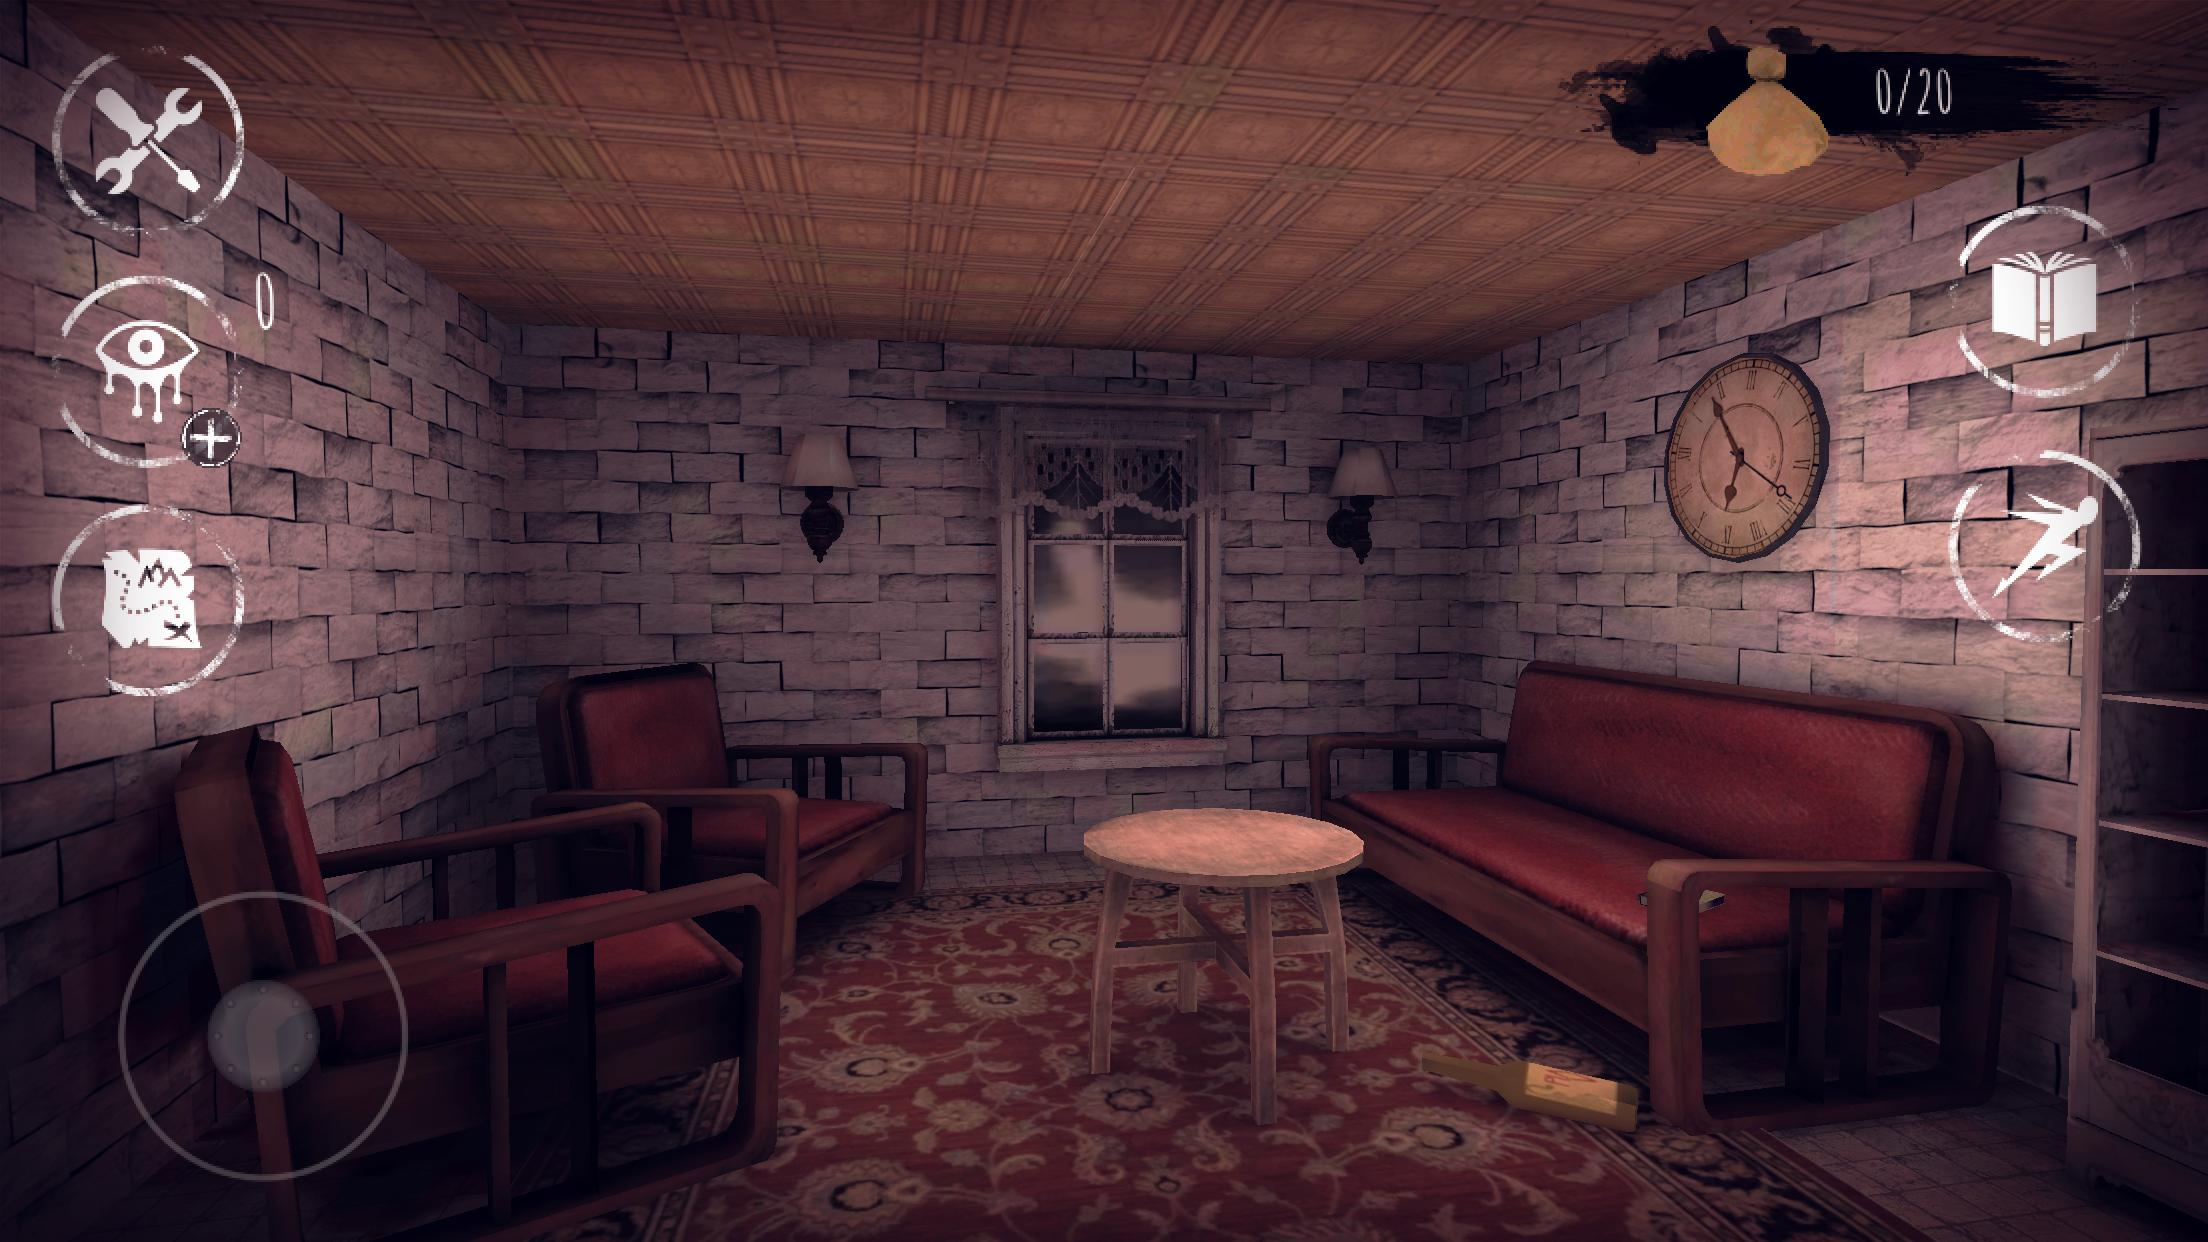 Eyes: Scary Thriller - Creepy Horror Game 6.1.21 Screenshot 12